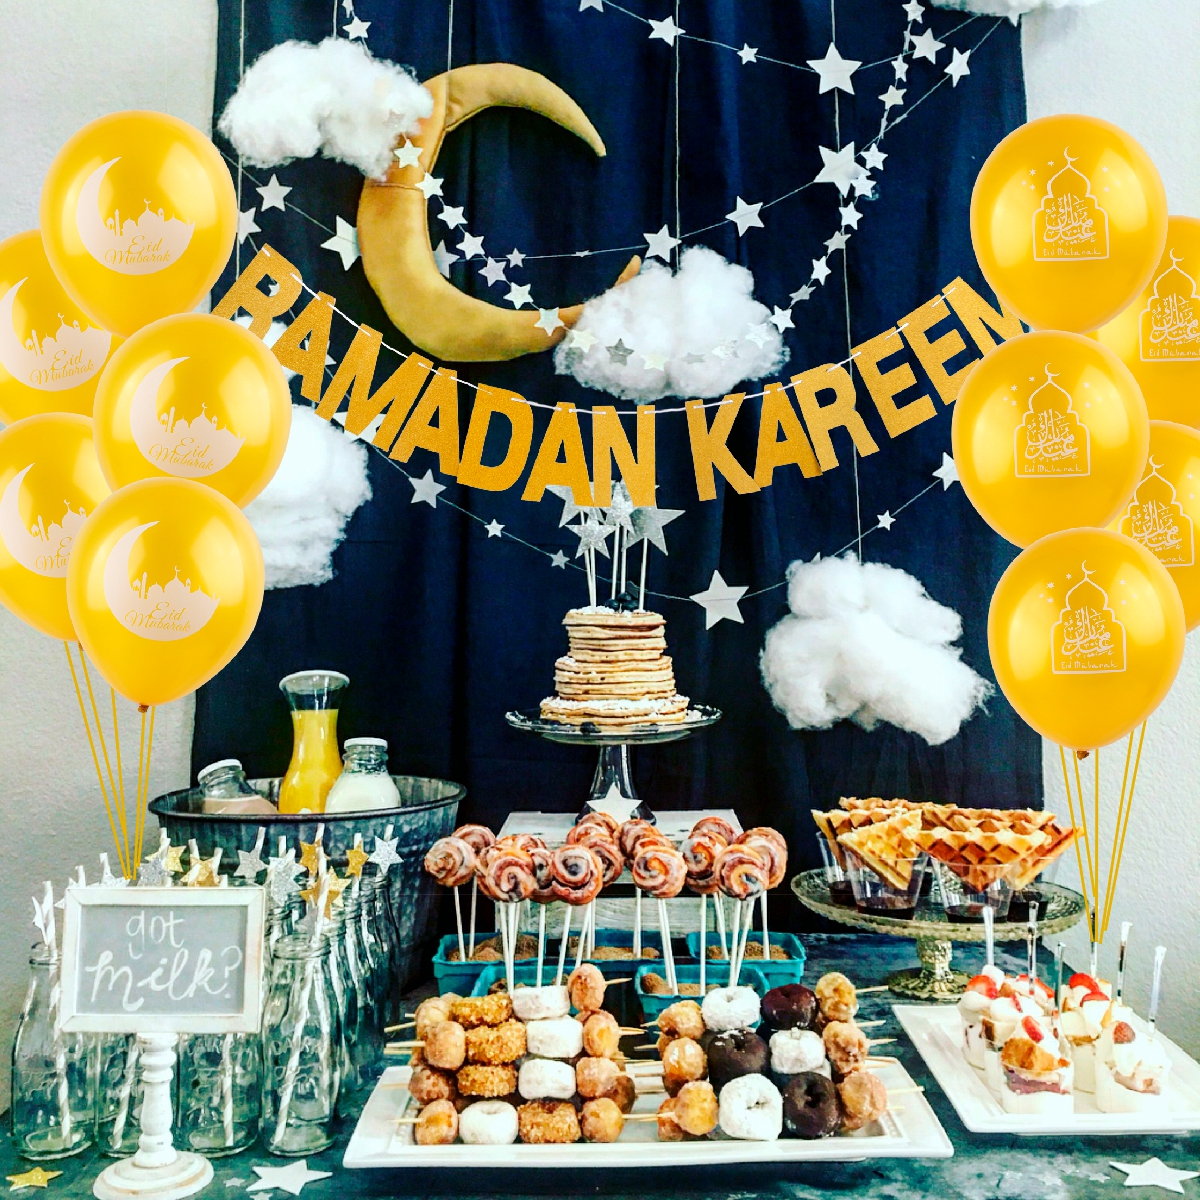 Eid Mubarak Dekoration Kareem Glücklich Ramadan Dekoration Muslim Islamischen Muslimischen Festival Dekoration Ramadan Liefert Hilfe Mubarek